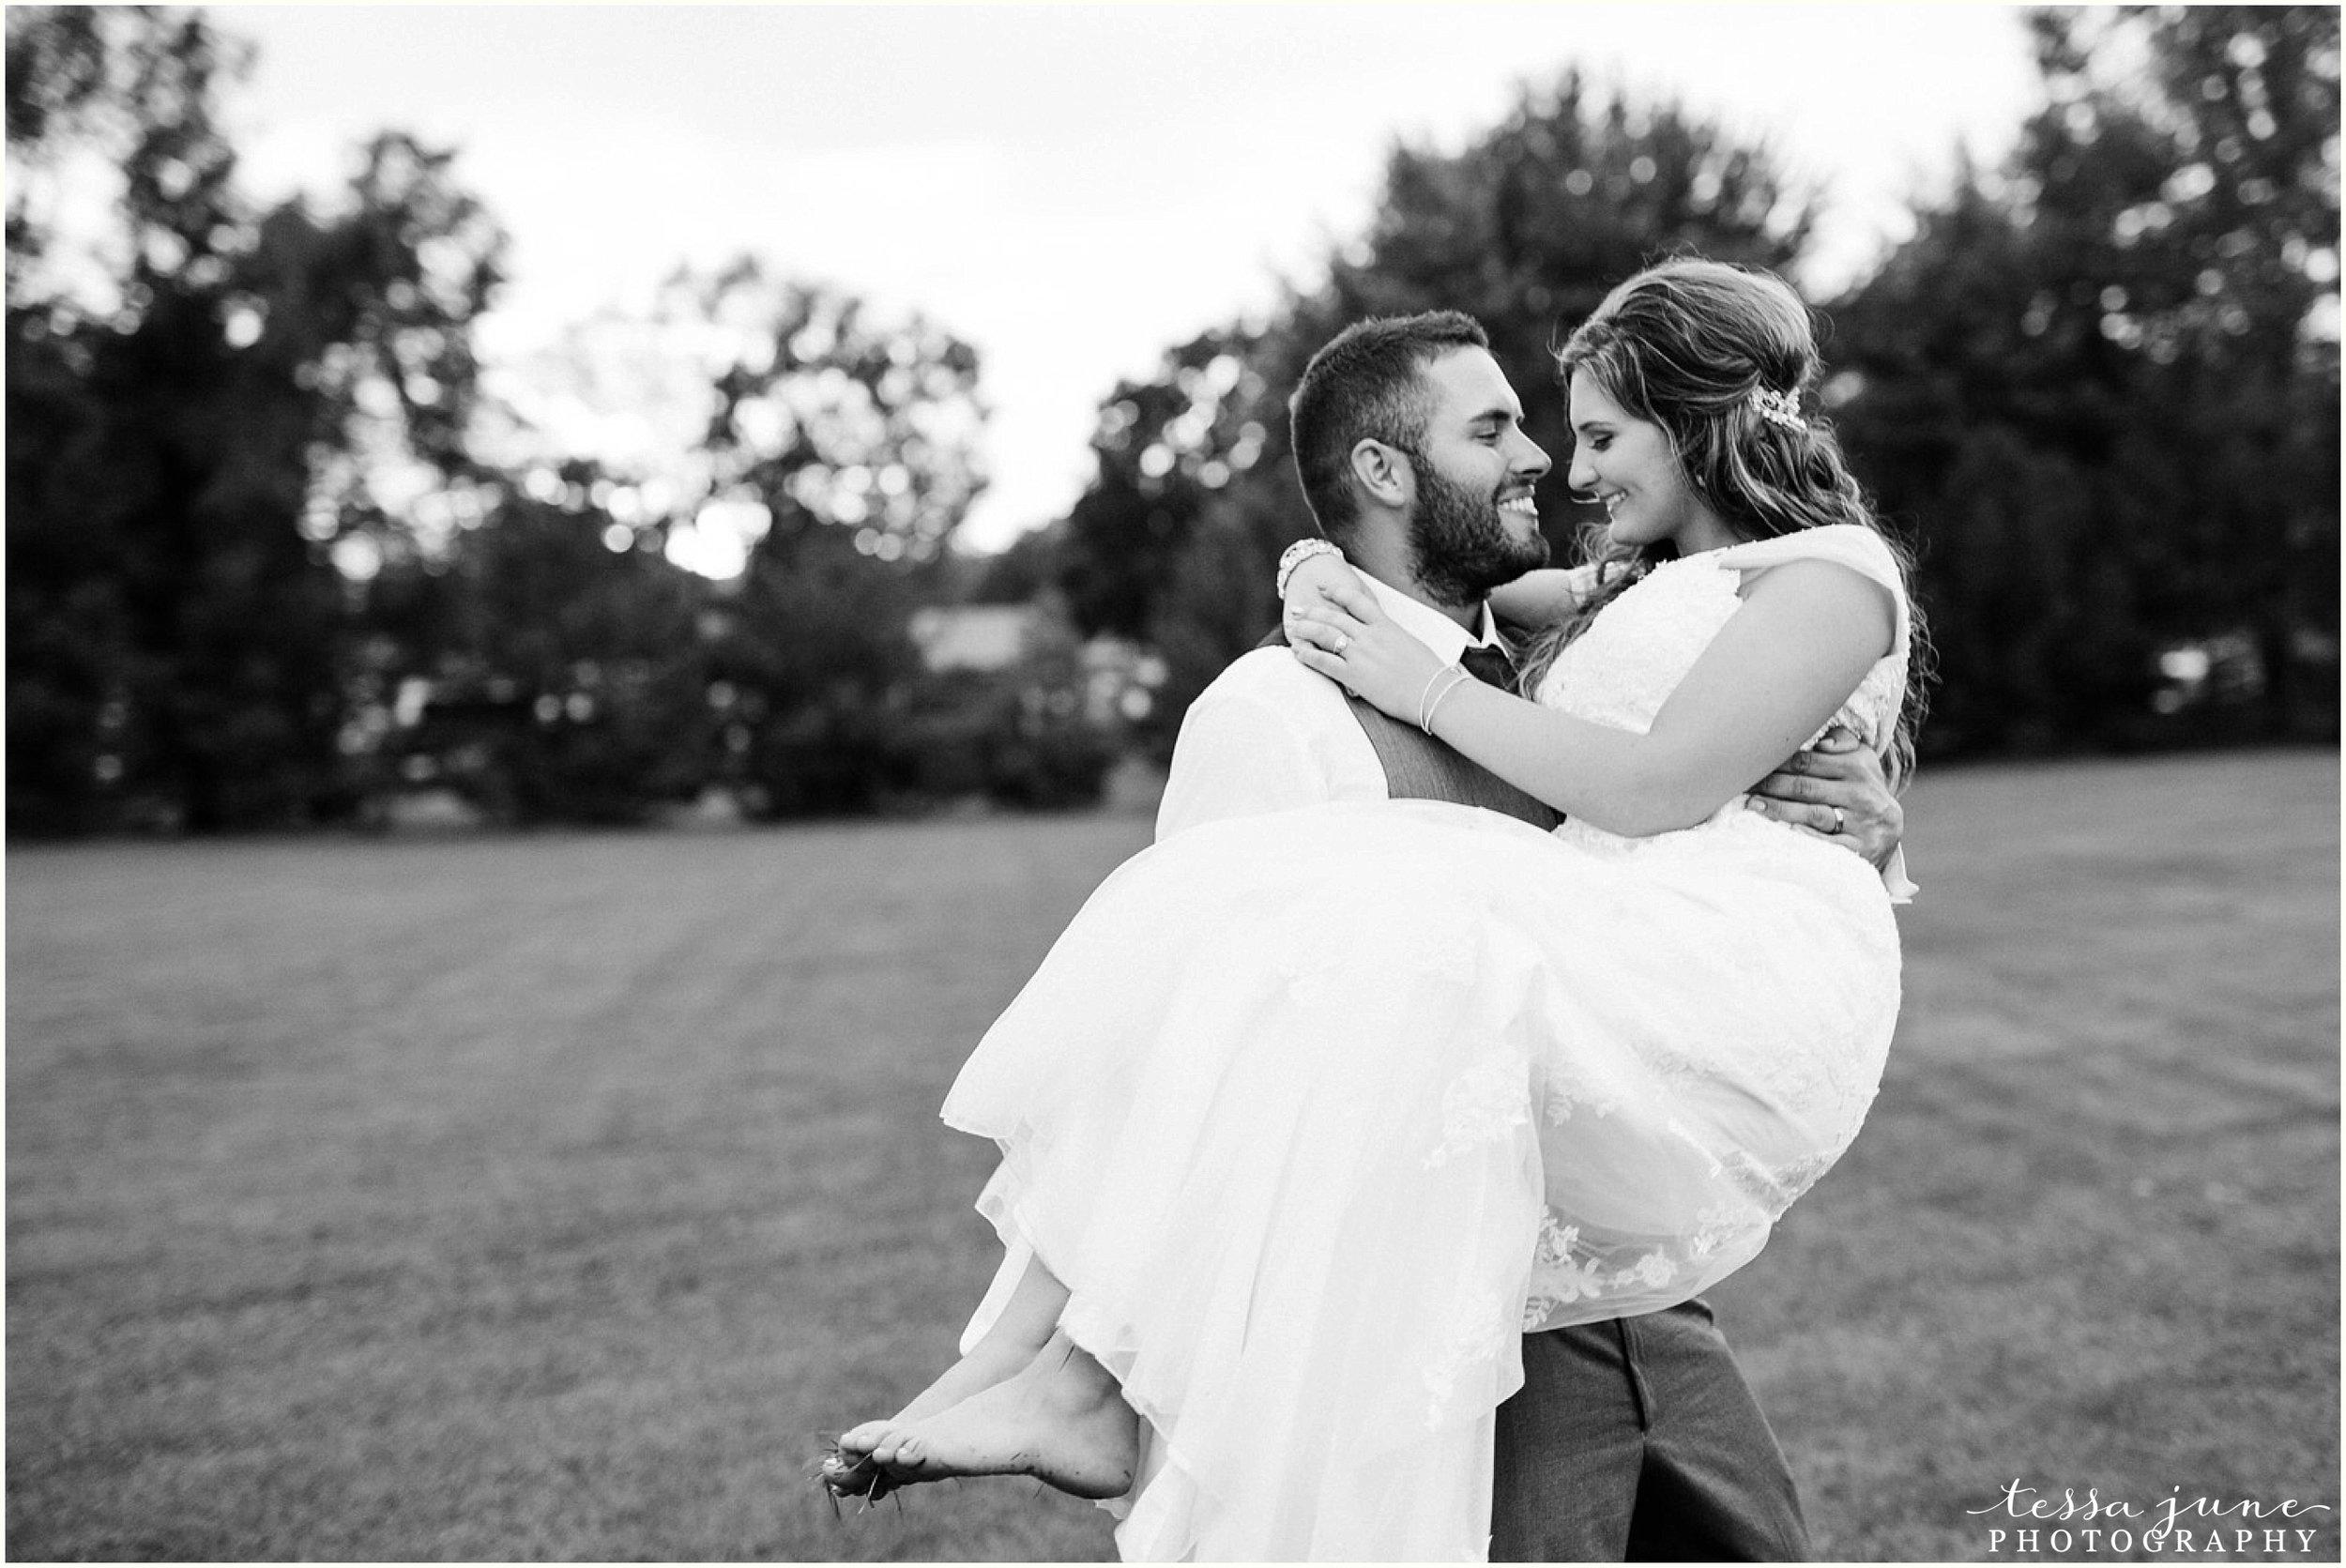 bohemian-minnesota-wedding-mismatched-bridesmaid-dresses-waterfall-st-cloud-tessa-june-photography-180.jpg